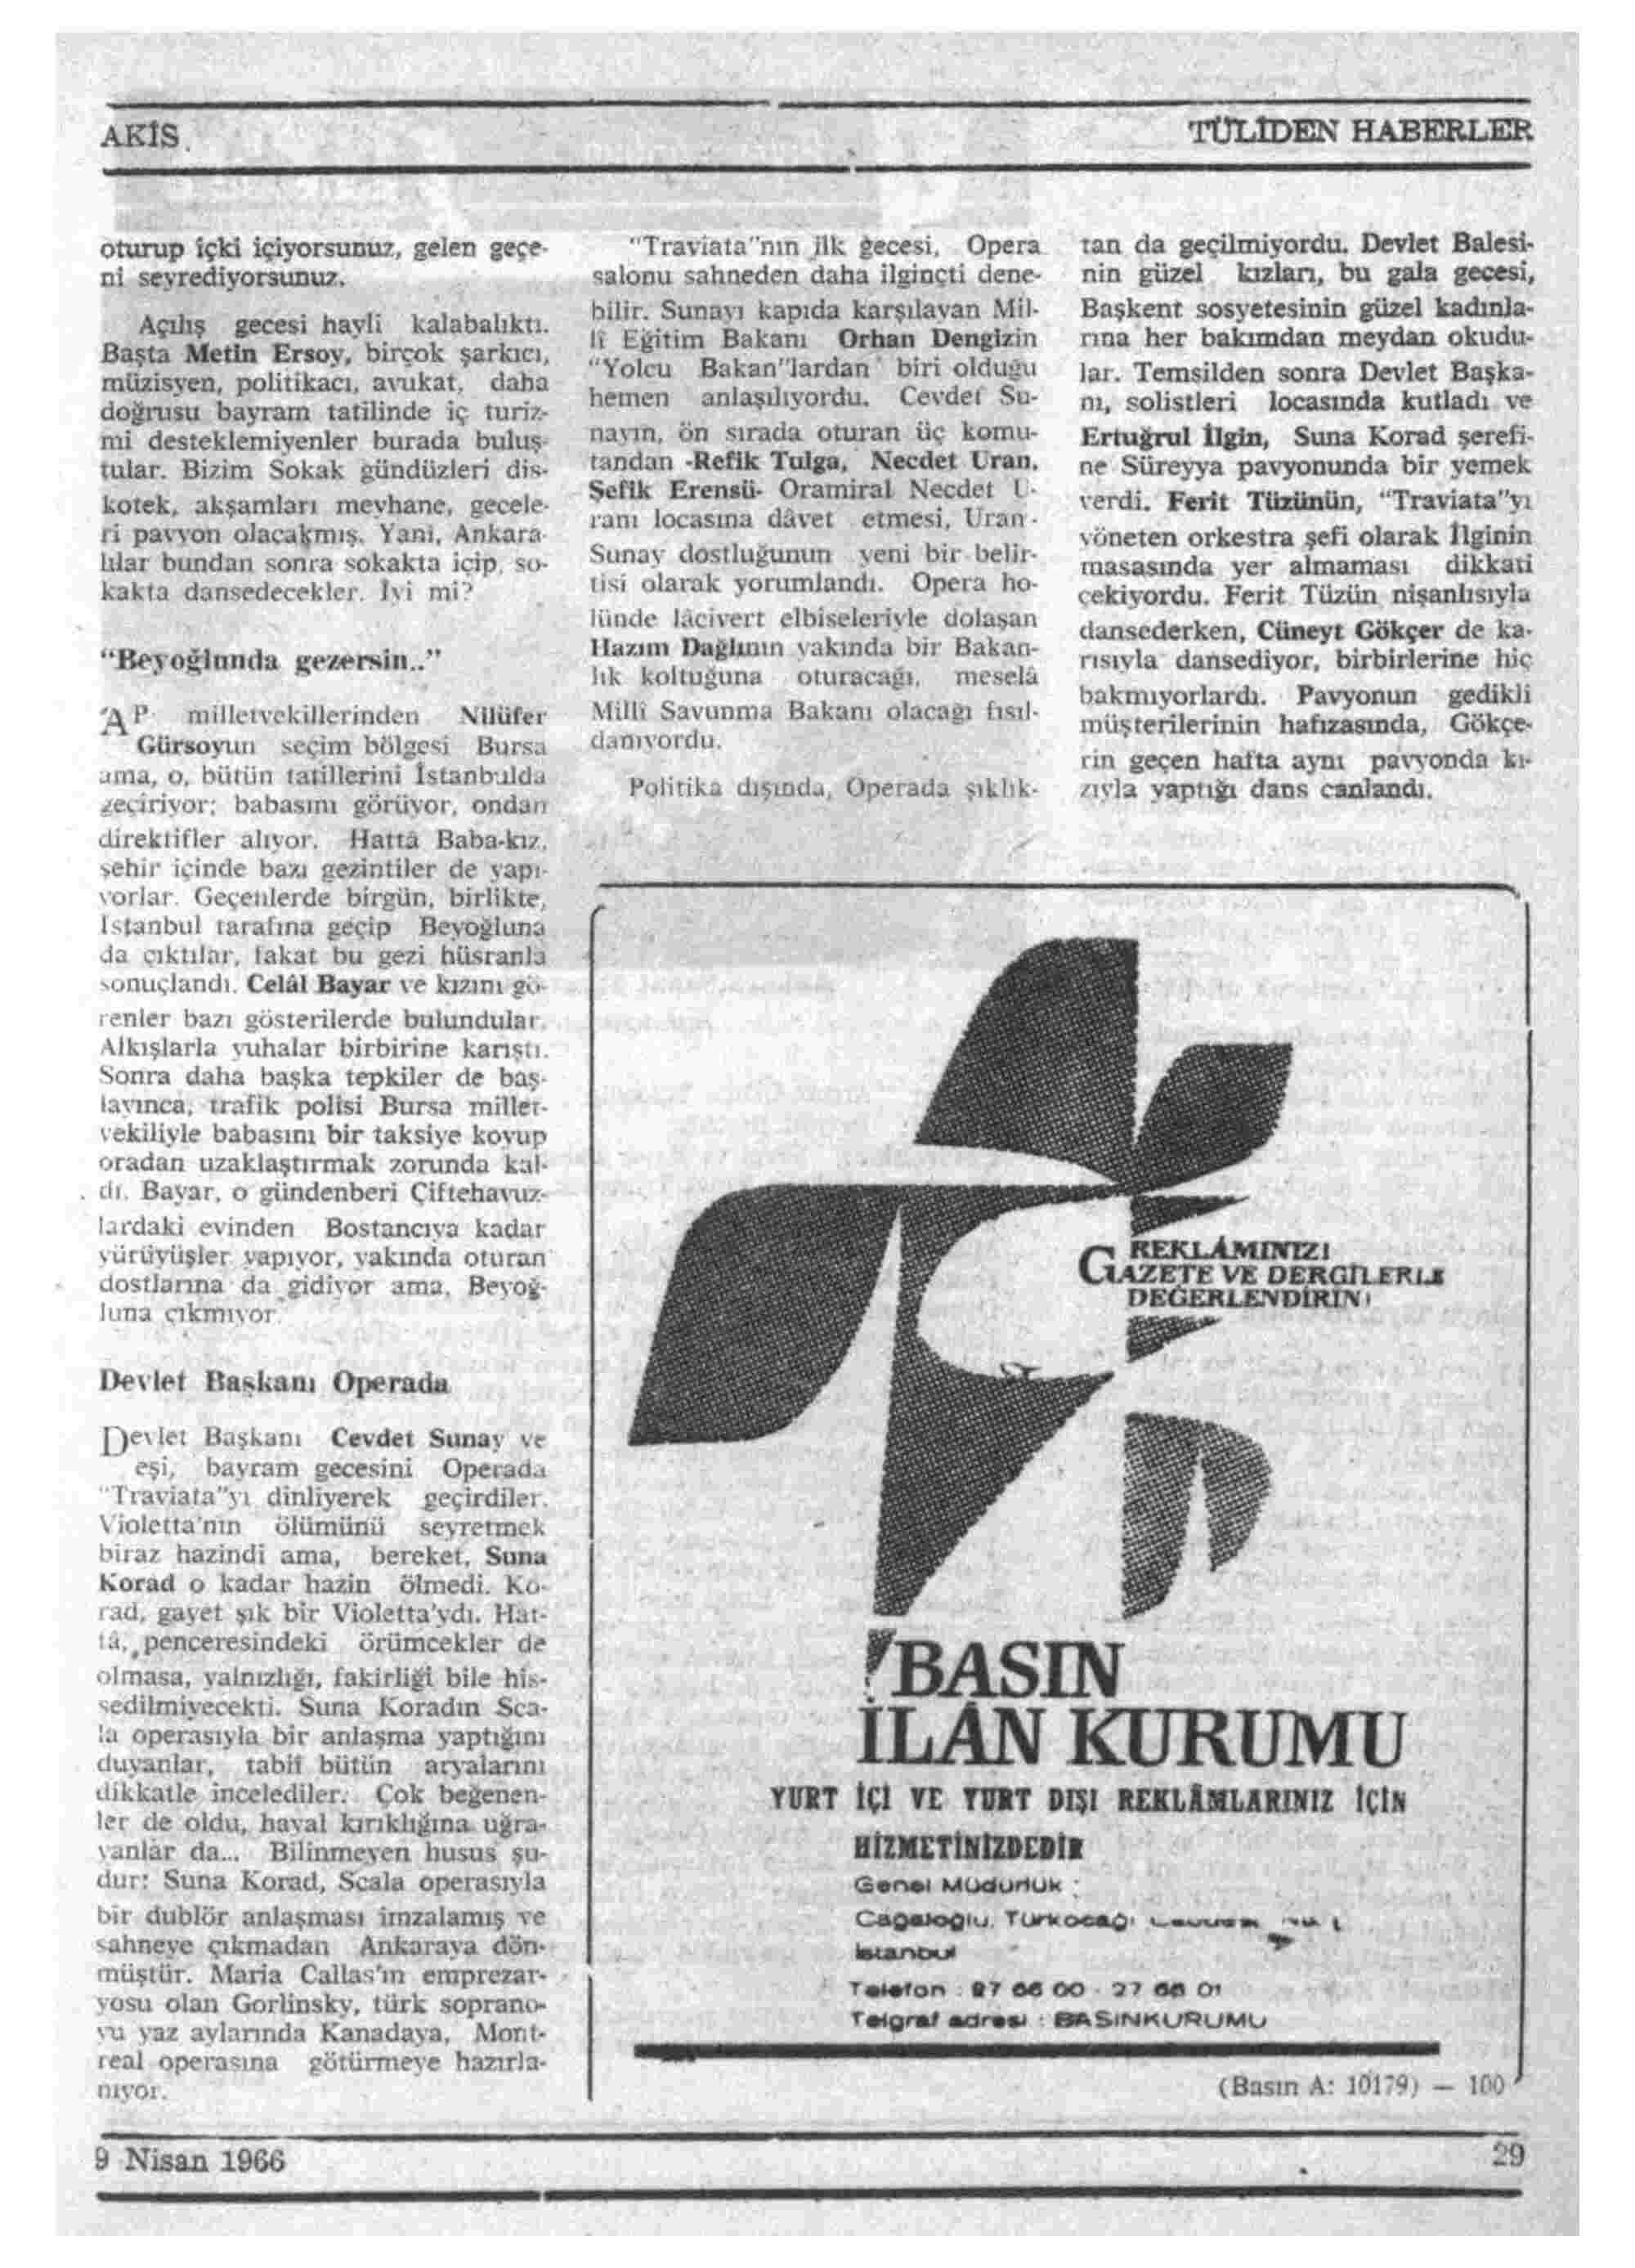 9 Nisan 1966 Tarihli Akis Dergisi Sayfa 29